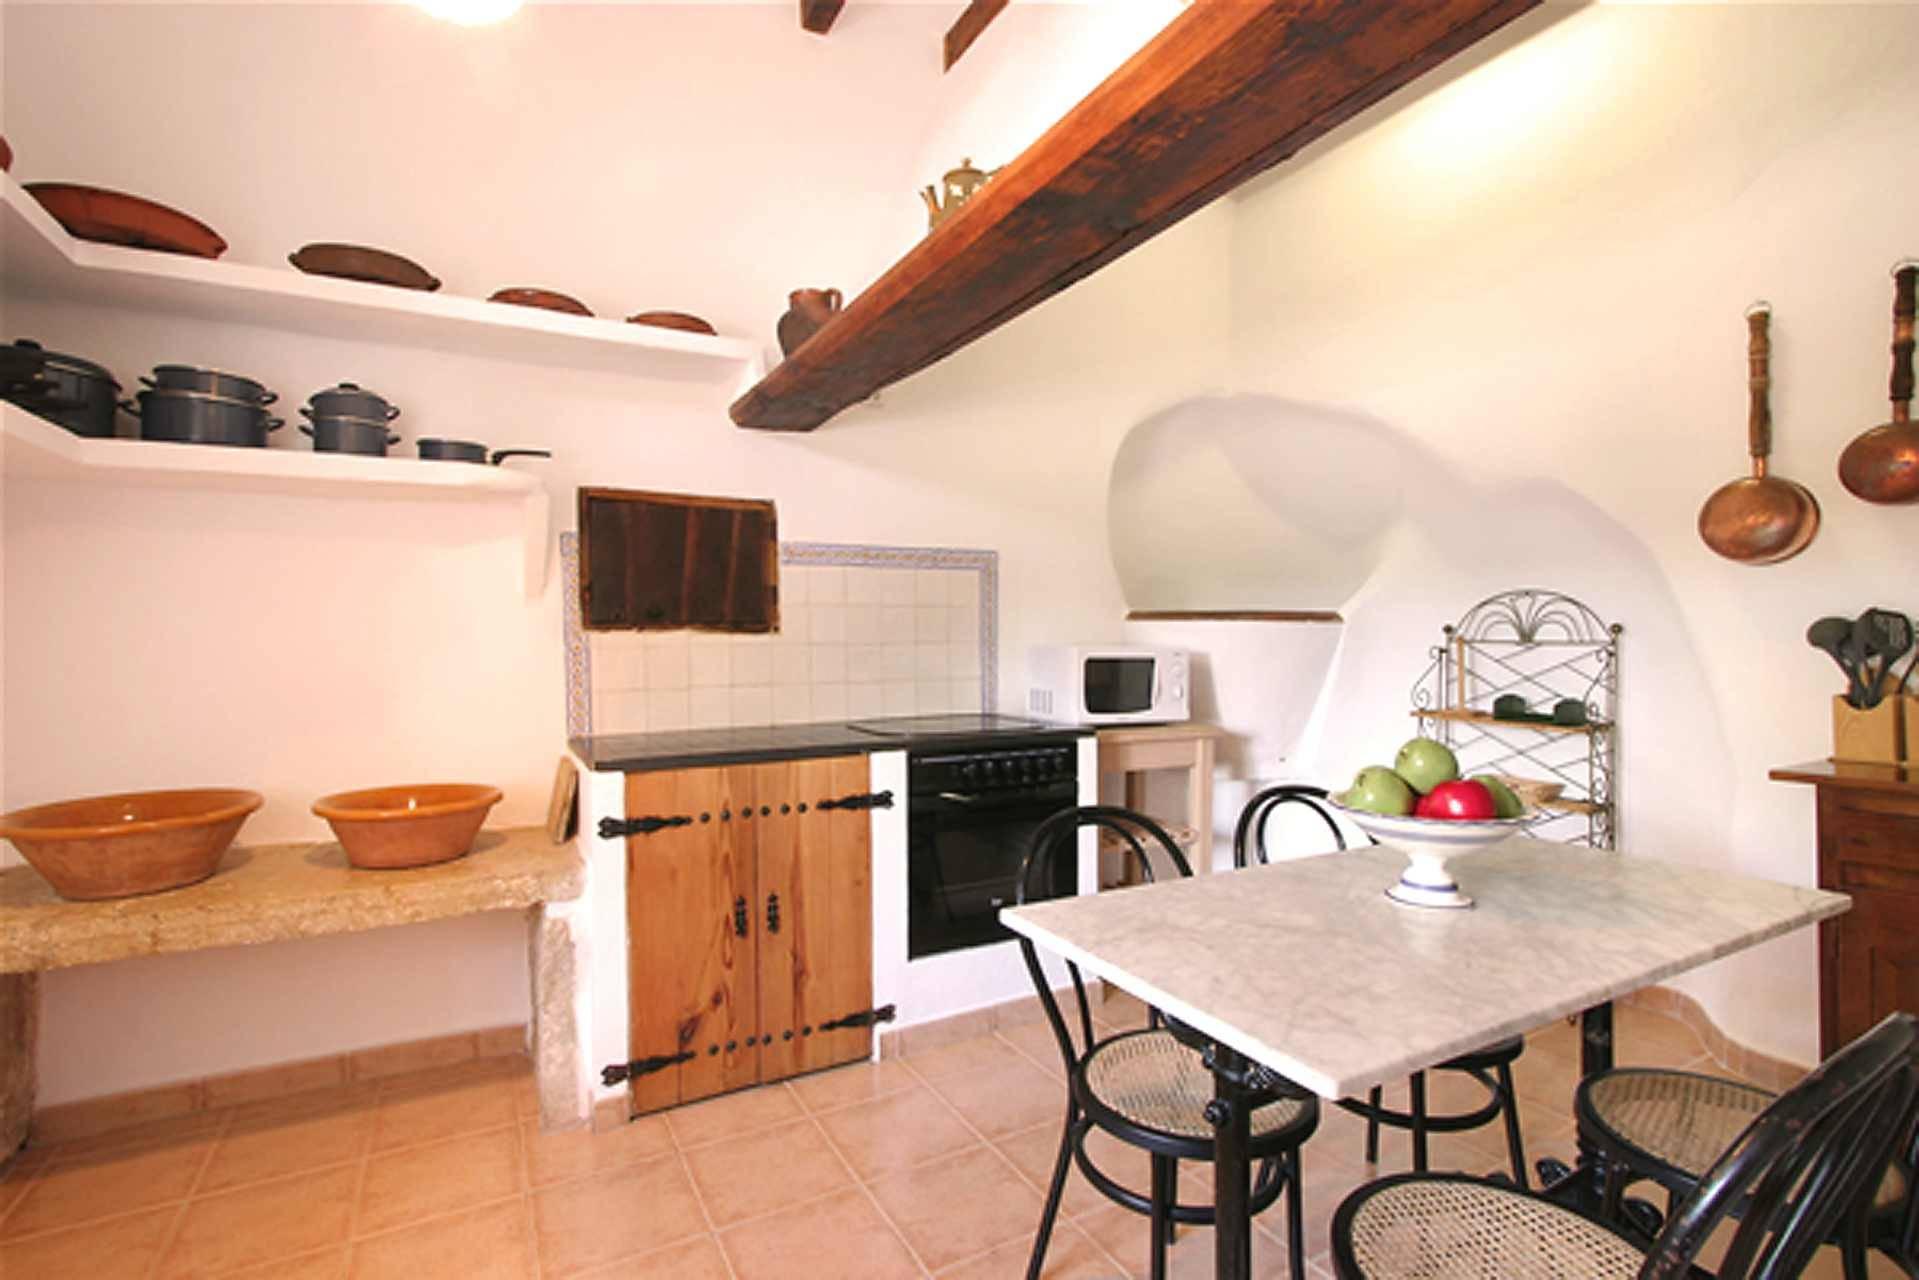 01-06 Charming Holiday Home Mallorca north Bild 11